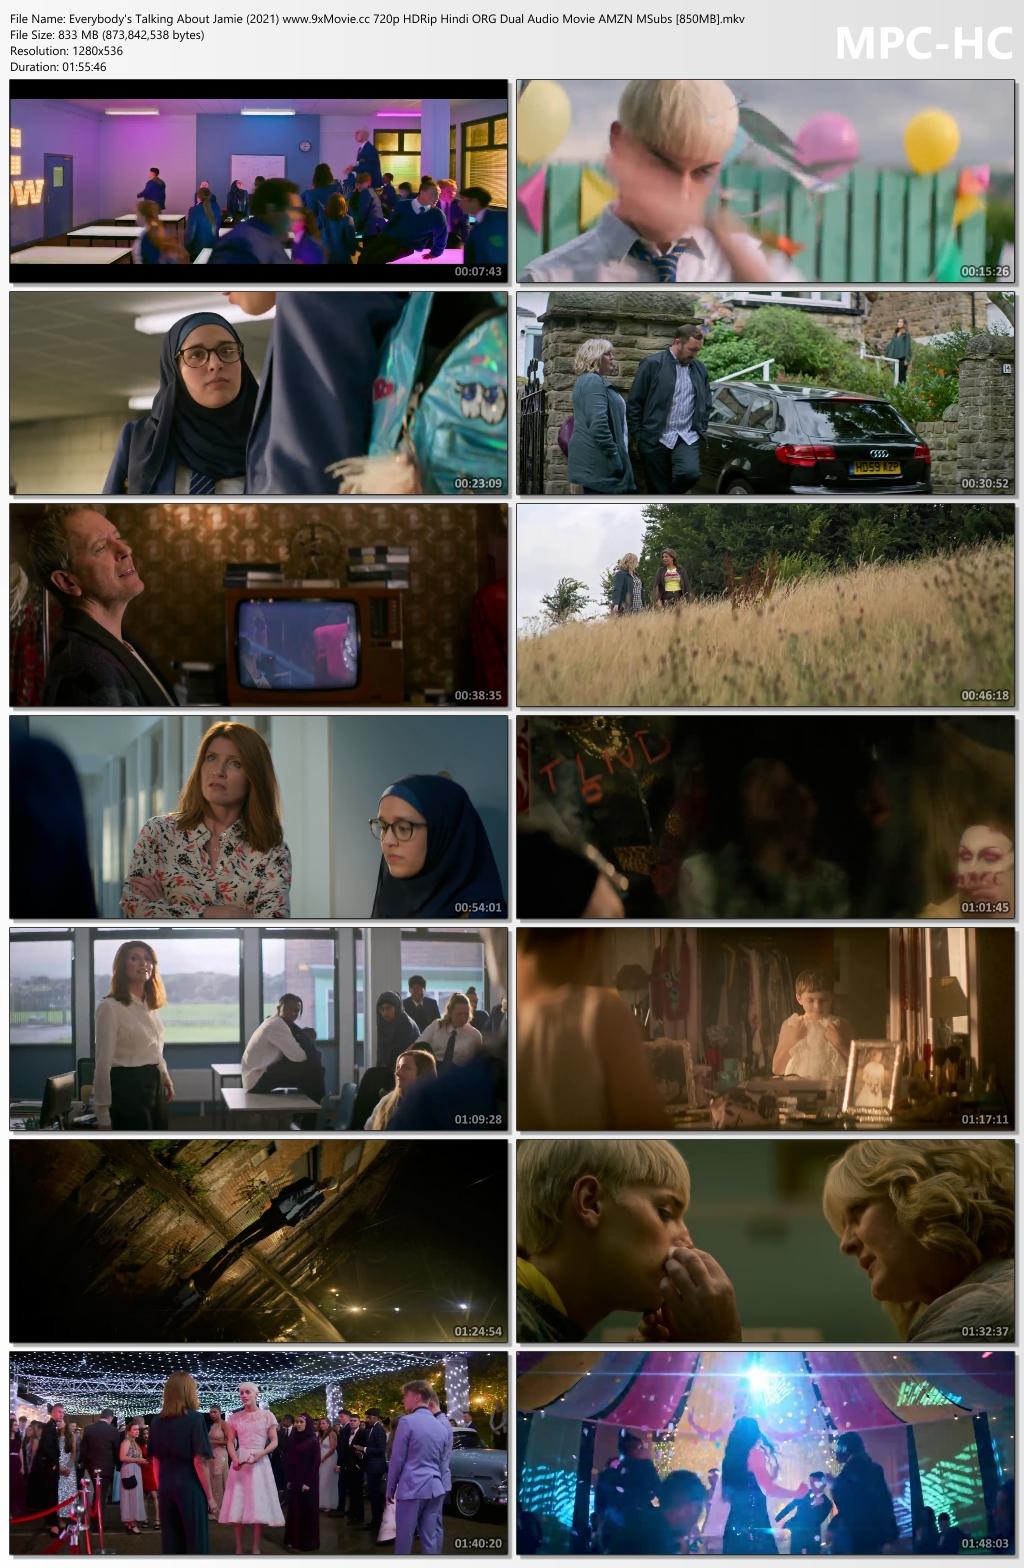 Everybody-s-Talking-About-Jamie-2021-www-9x-Movie-cc-720p-HDRip-Hindi-ORG-Dual-Audio-Movie-AMZN-MSub